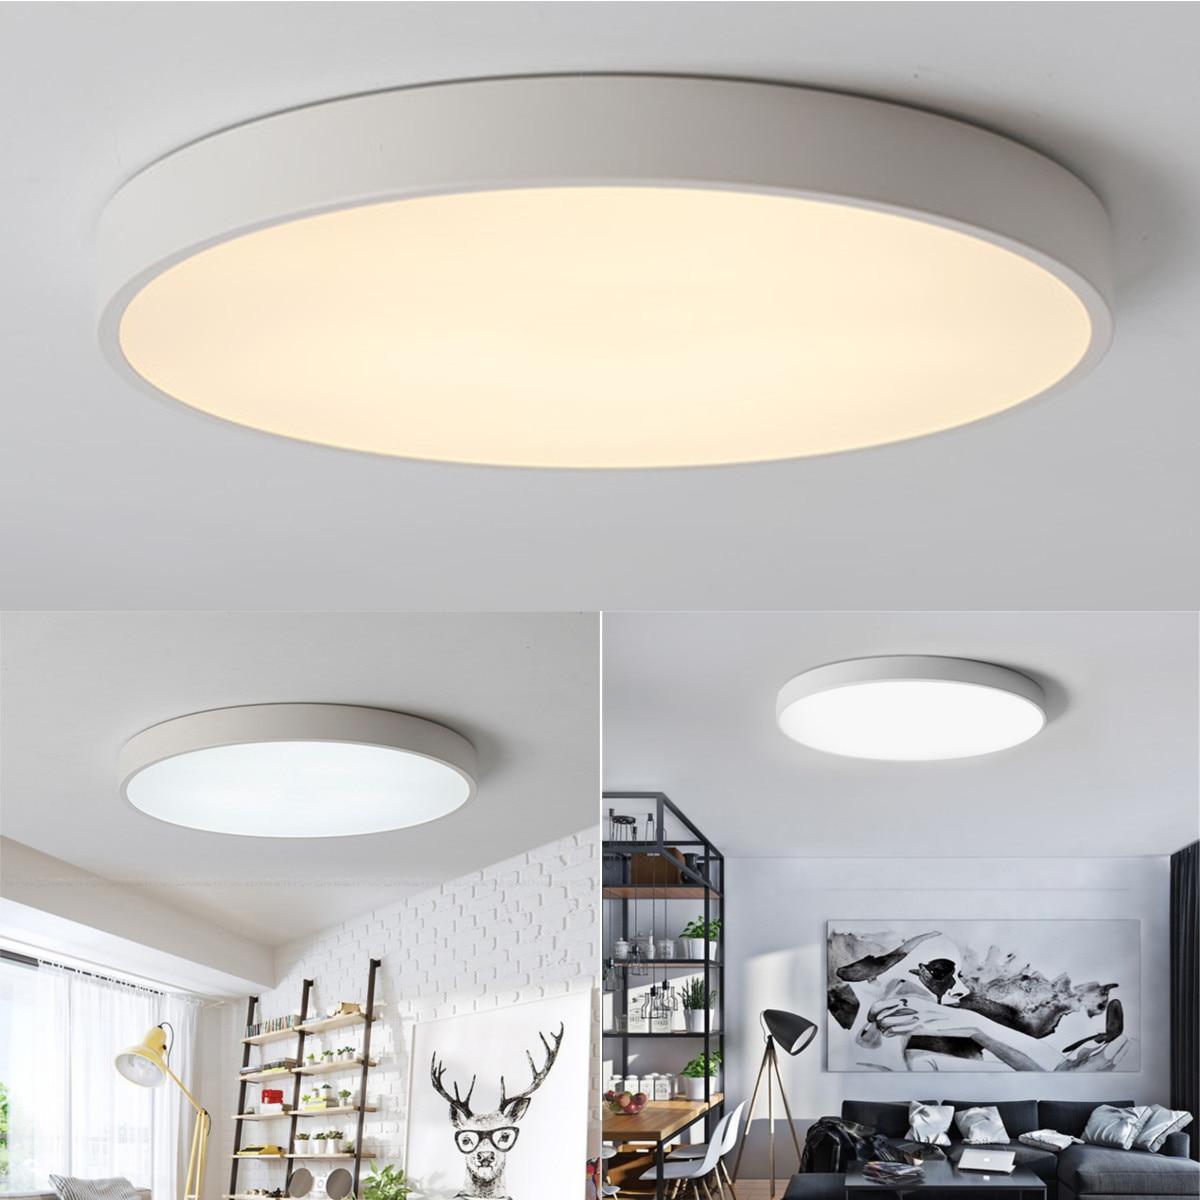 Buy retro led ceiling light acrylic led - Living room ceiling light fixture ...